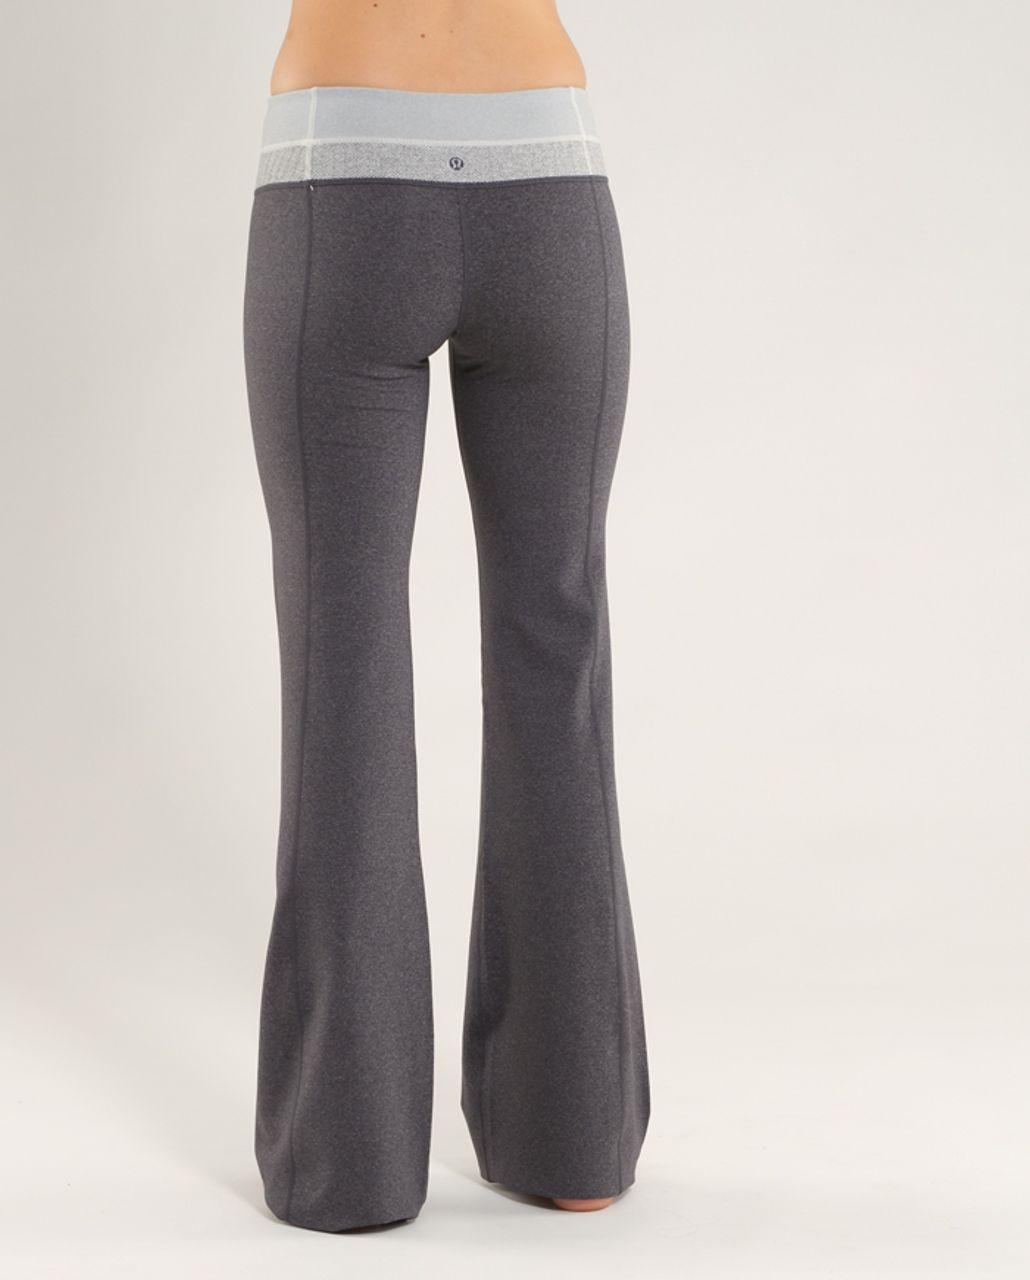 Lululemon Groove Pant (Tall) - Heathered Coal /  Ghost Blurred Grey Mini Stripe